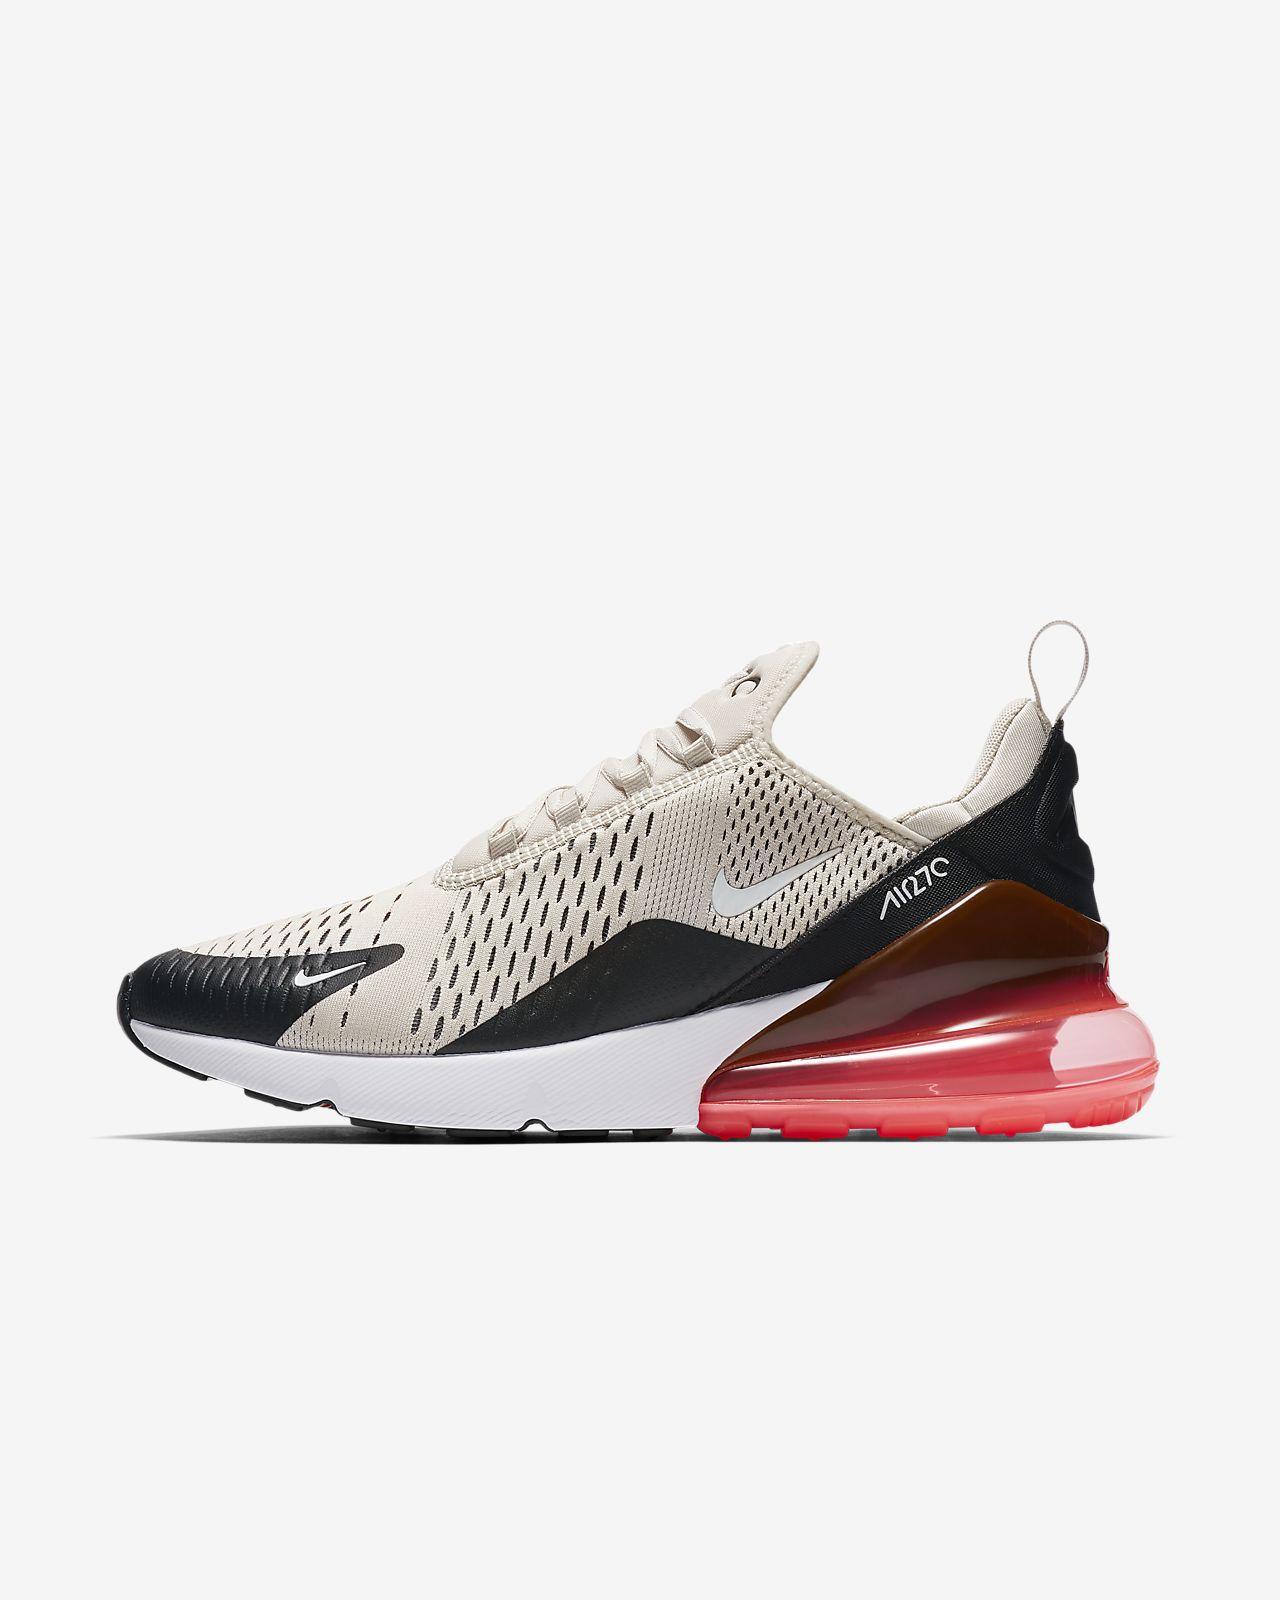 quality design 1a131 d3f97 Ανδρικό παπούτσι Nike Air Max 270